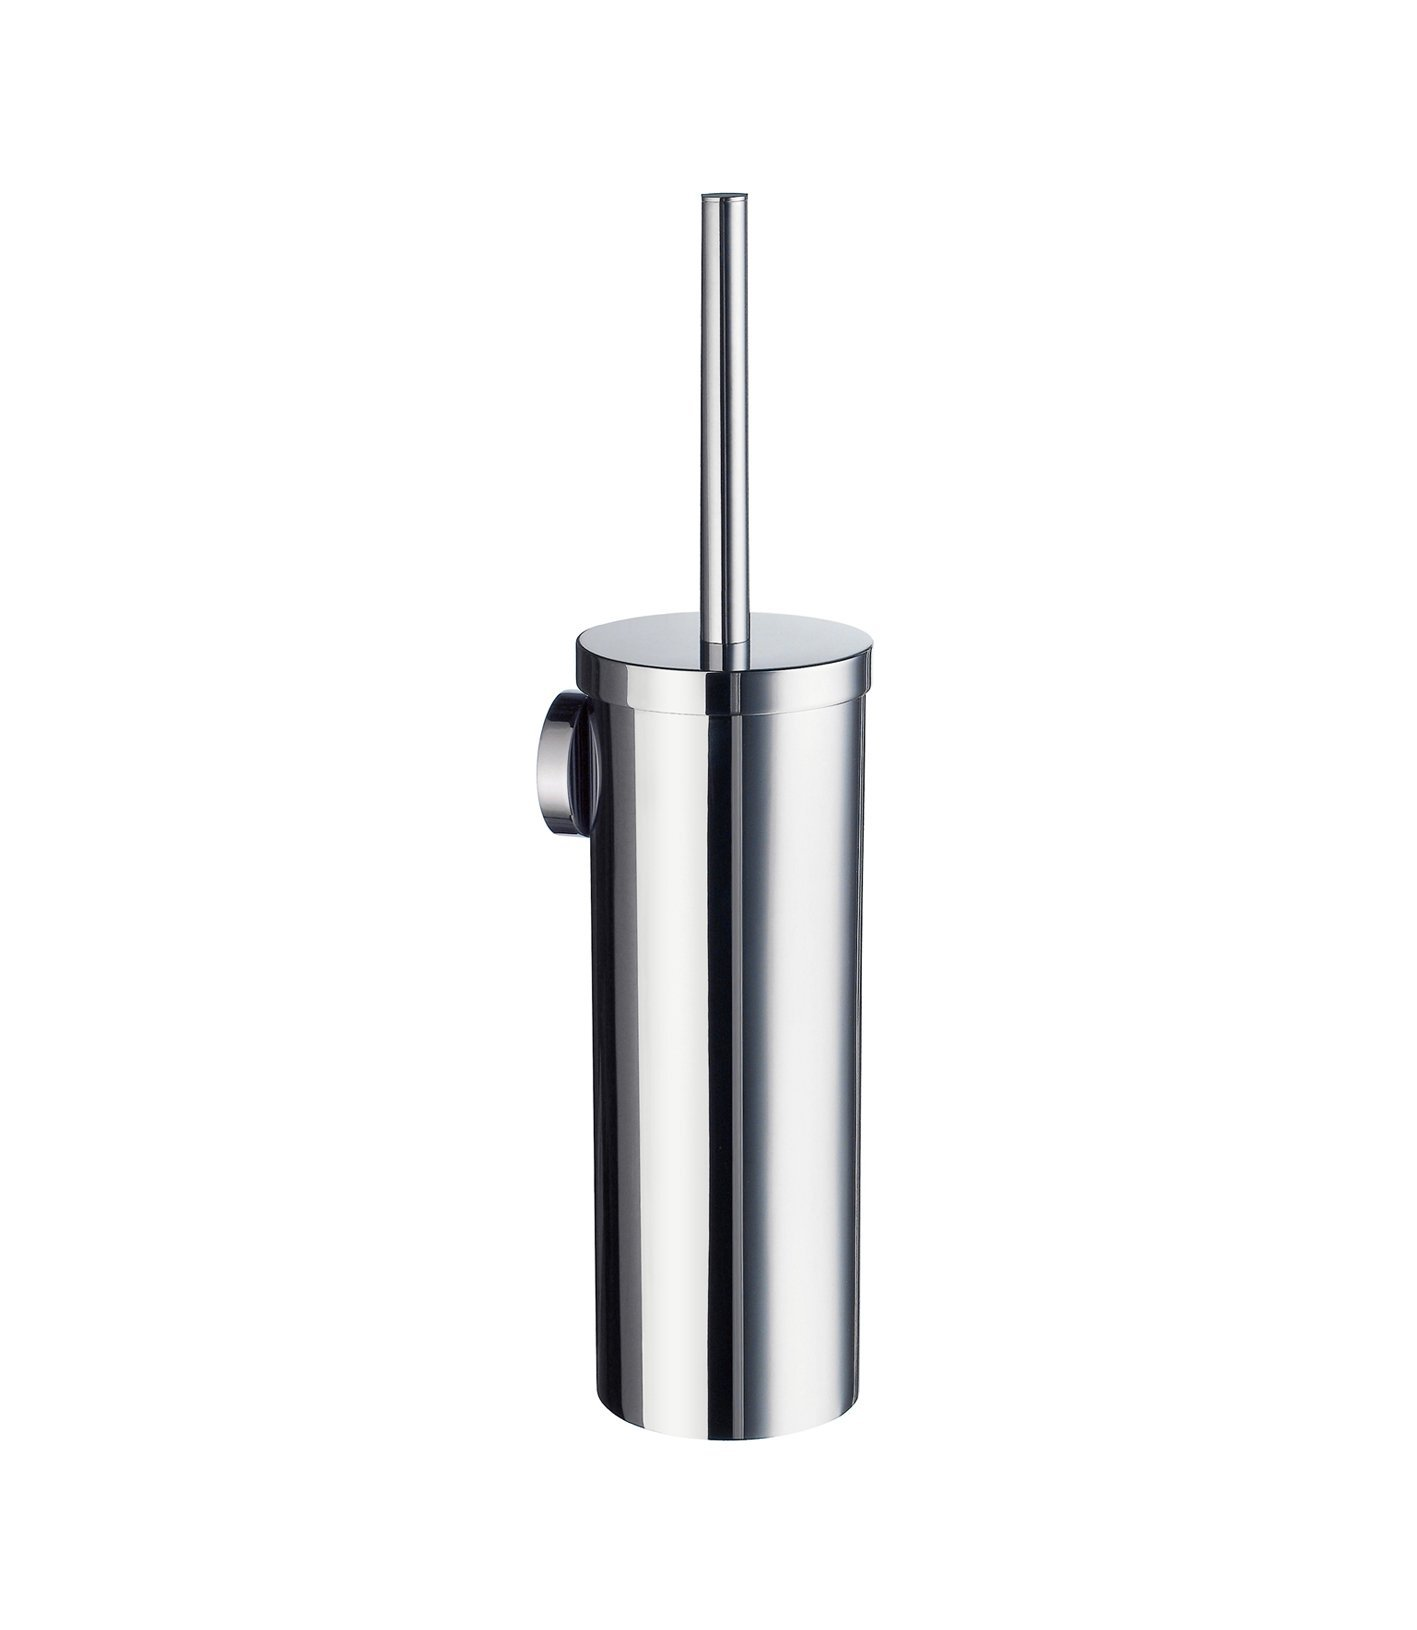 Smedbo SME HK332 Toilet Brush Wallmount, Polished Chrome by Smedbo (Image #1)